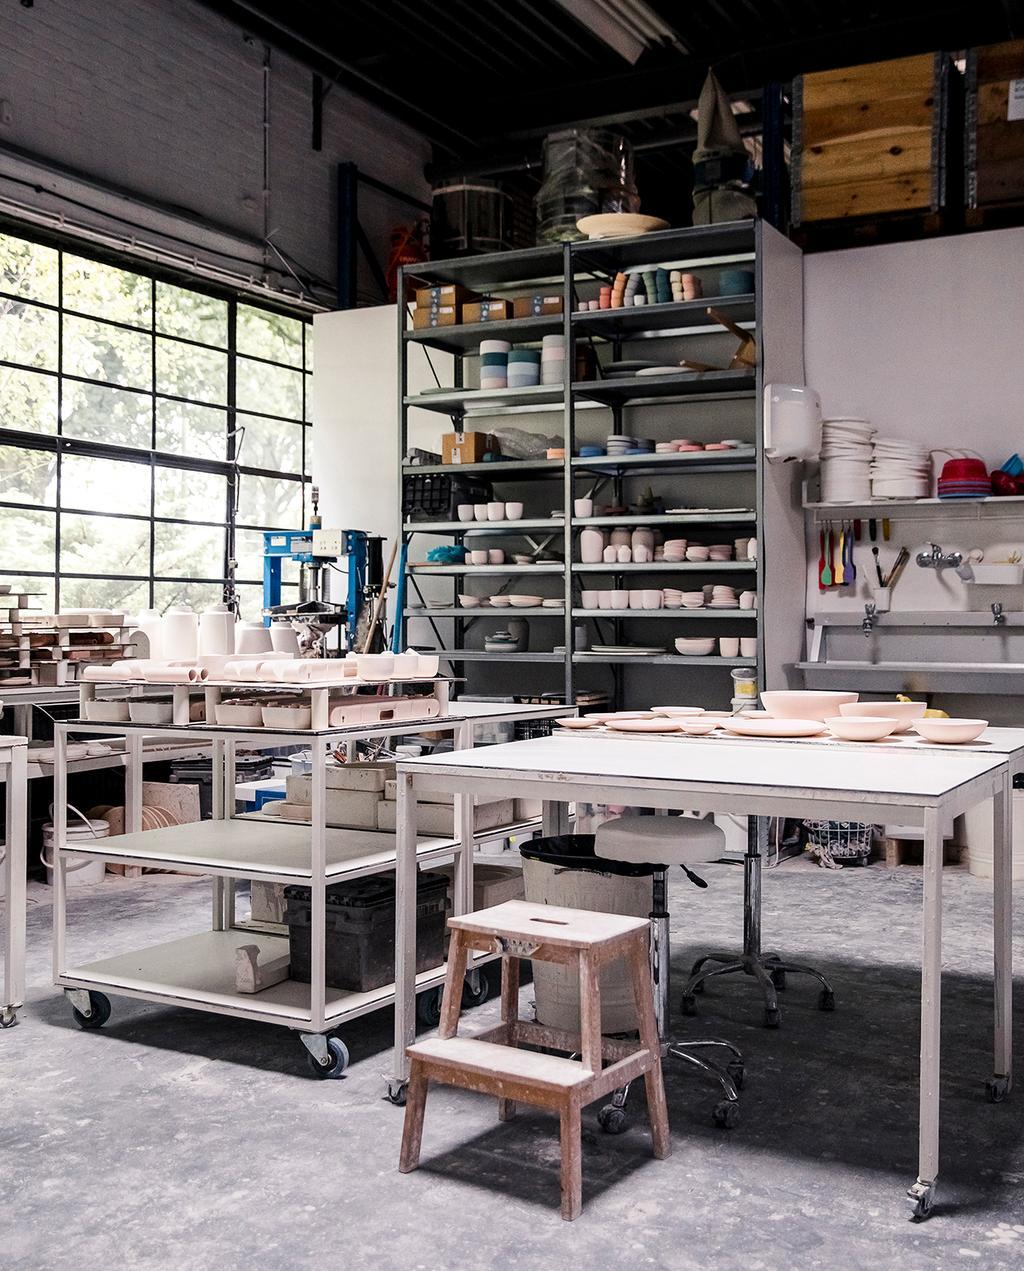 vtwonen DIY special 01 2020 | werkplaats porselein gieten